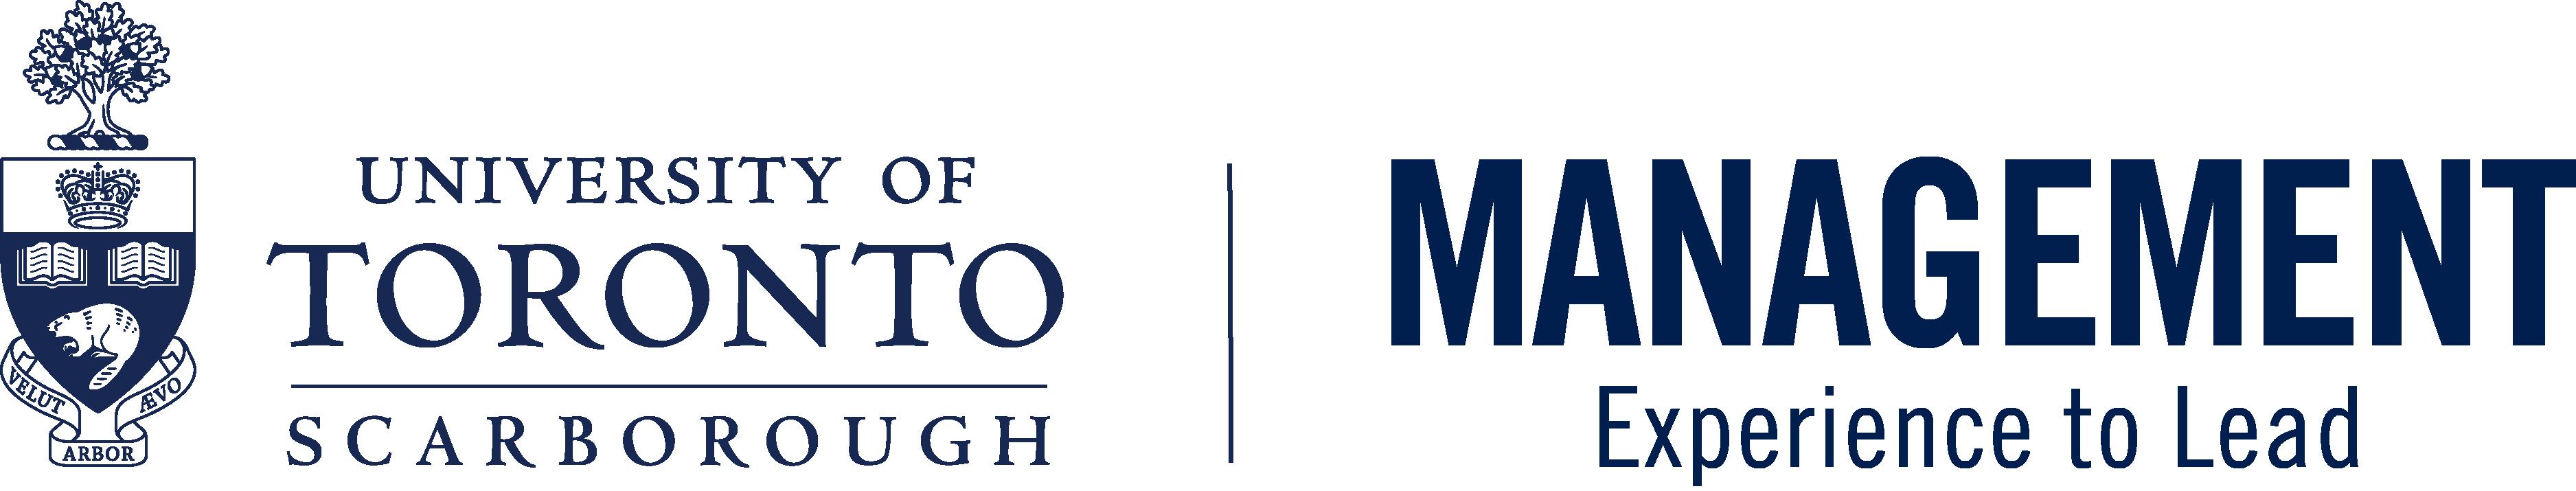 UTSC logo